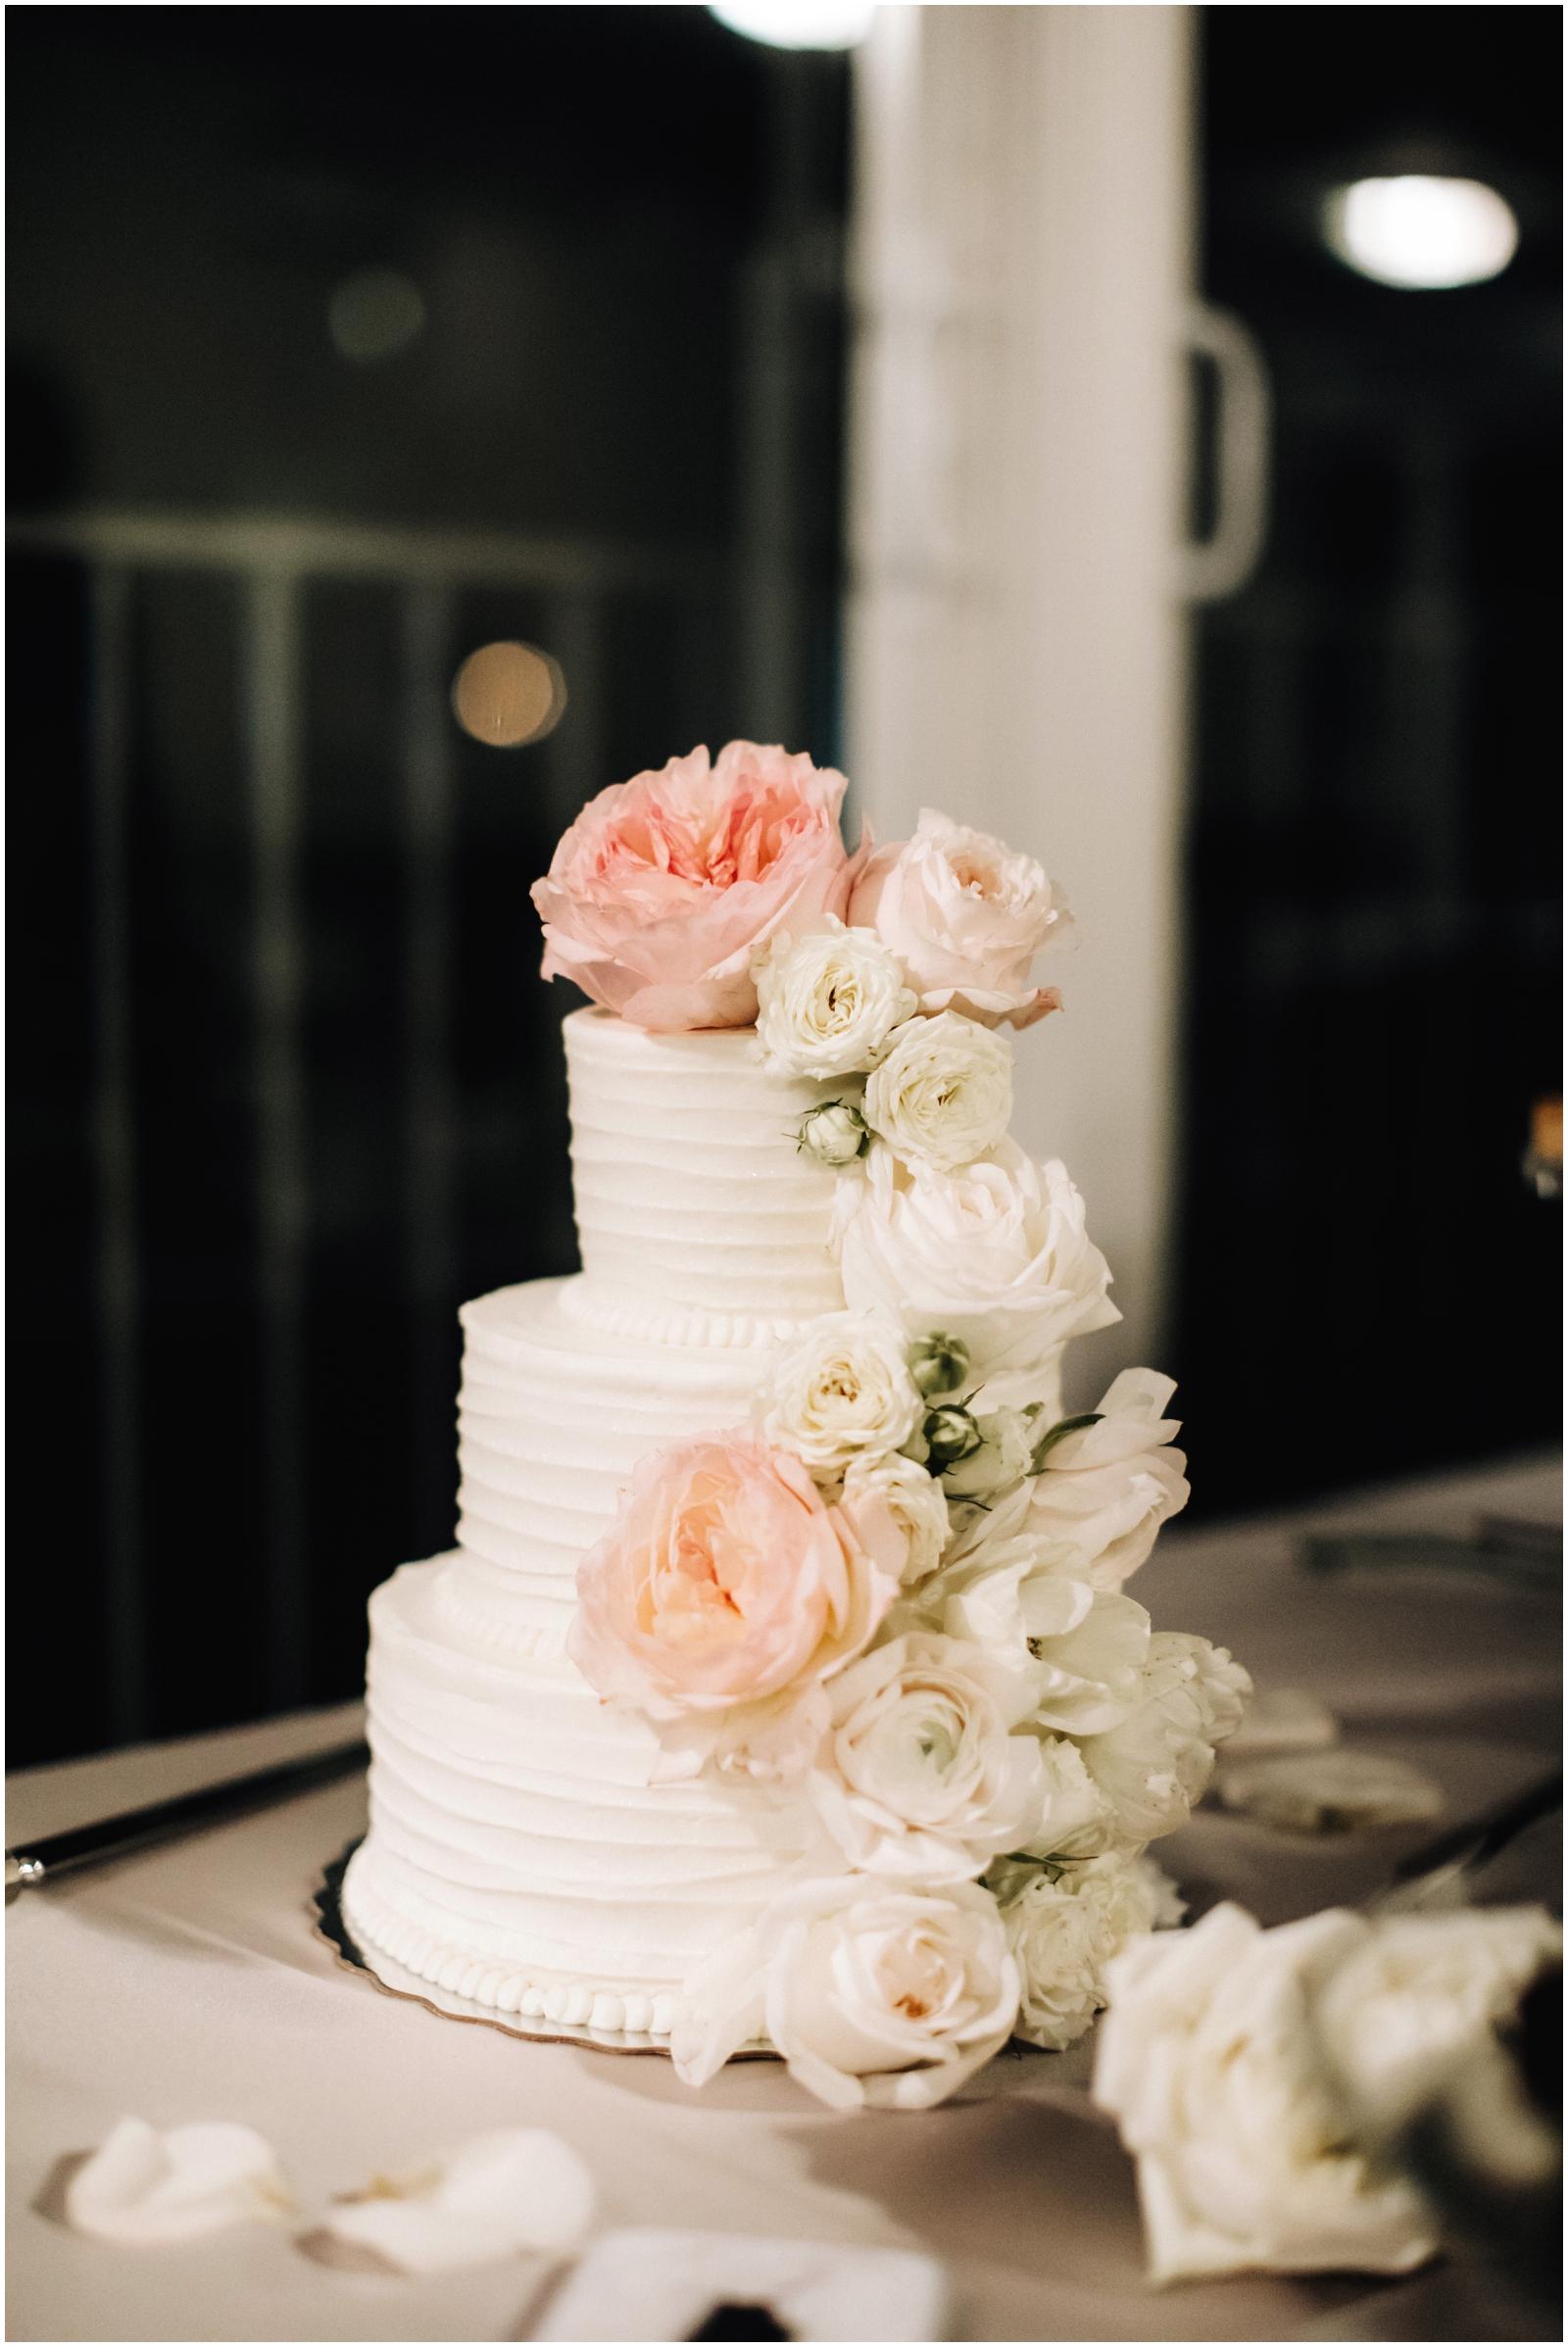 Minnesota Wedding Planner. Lafayette Club Wedding. Wedding Reception Inspiration. Wedding Decor. White wedding cake with floral